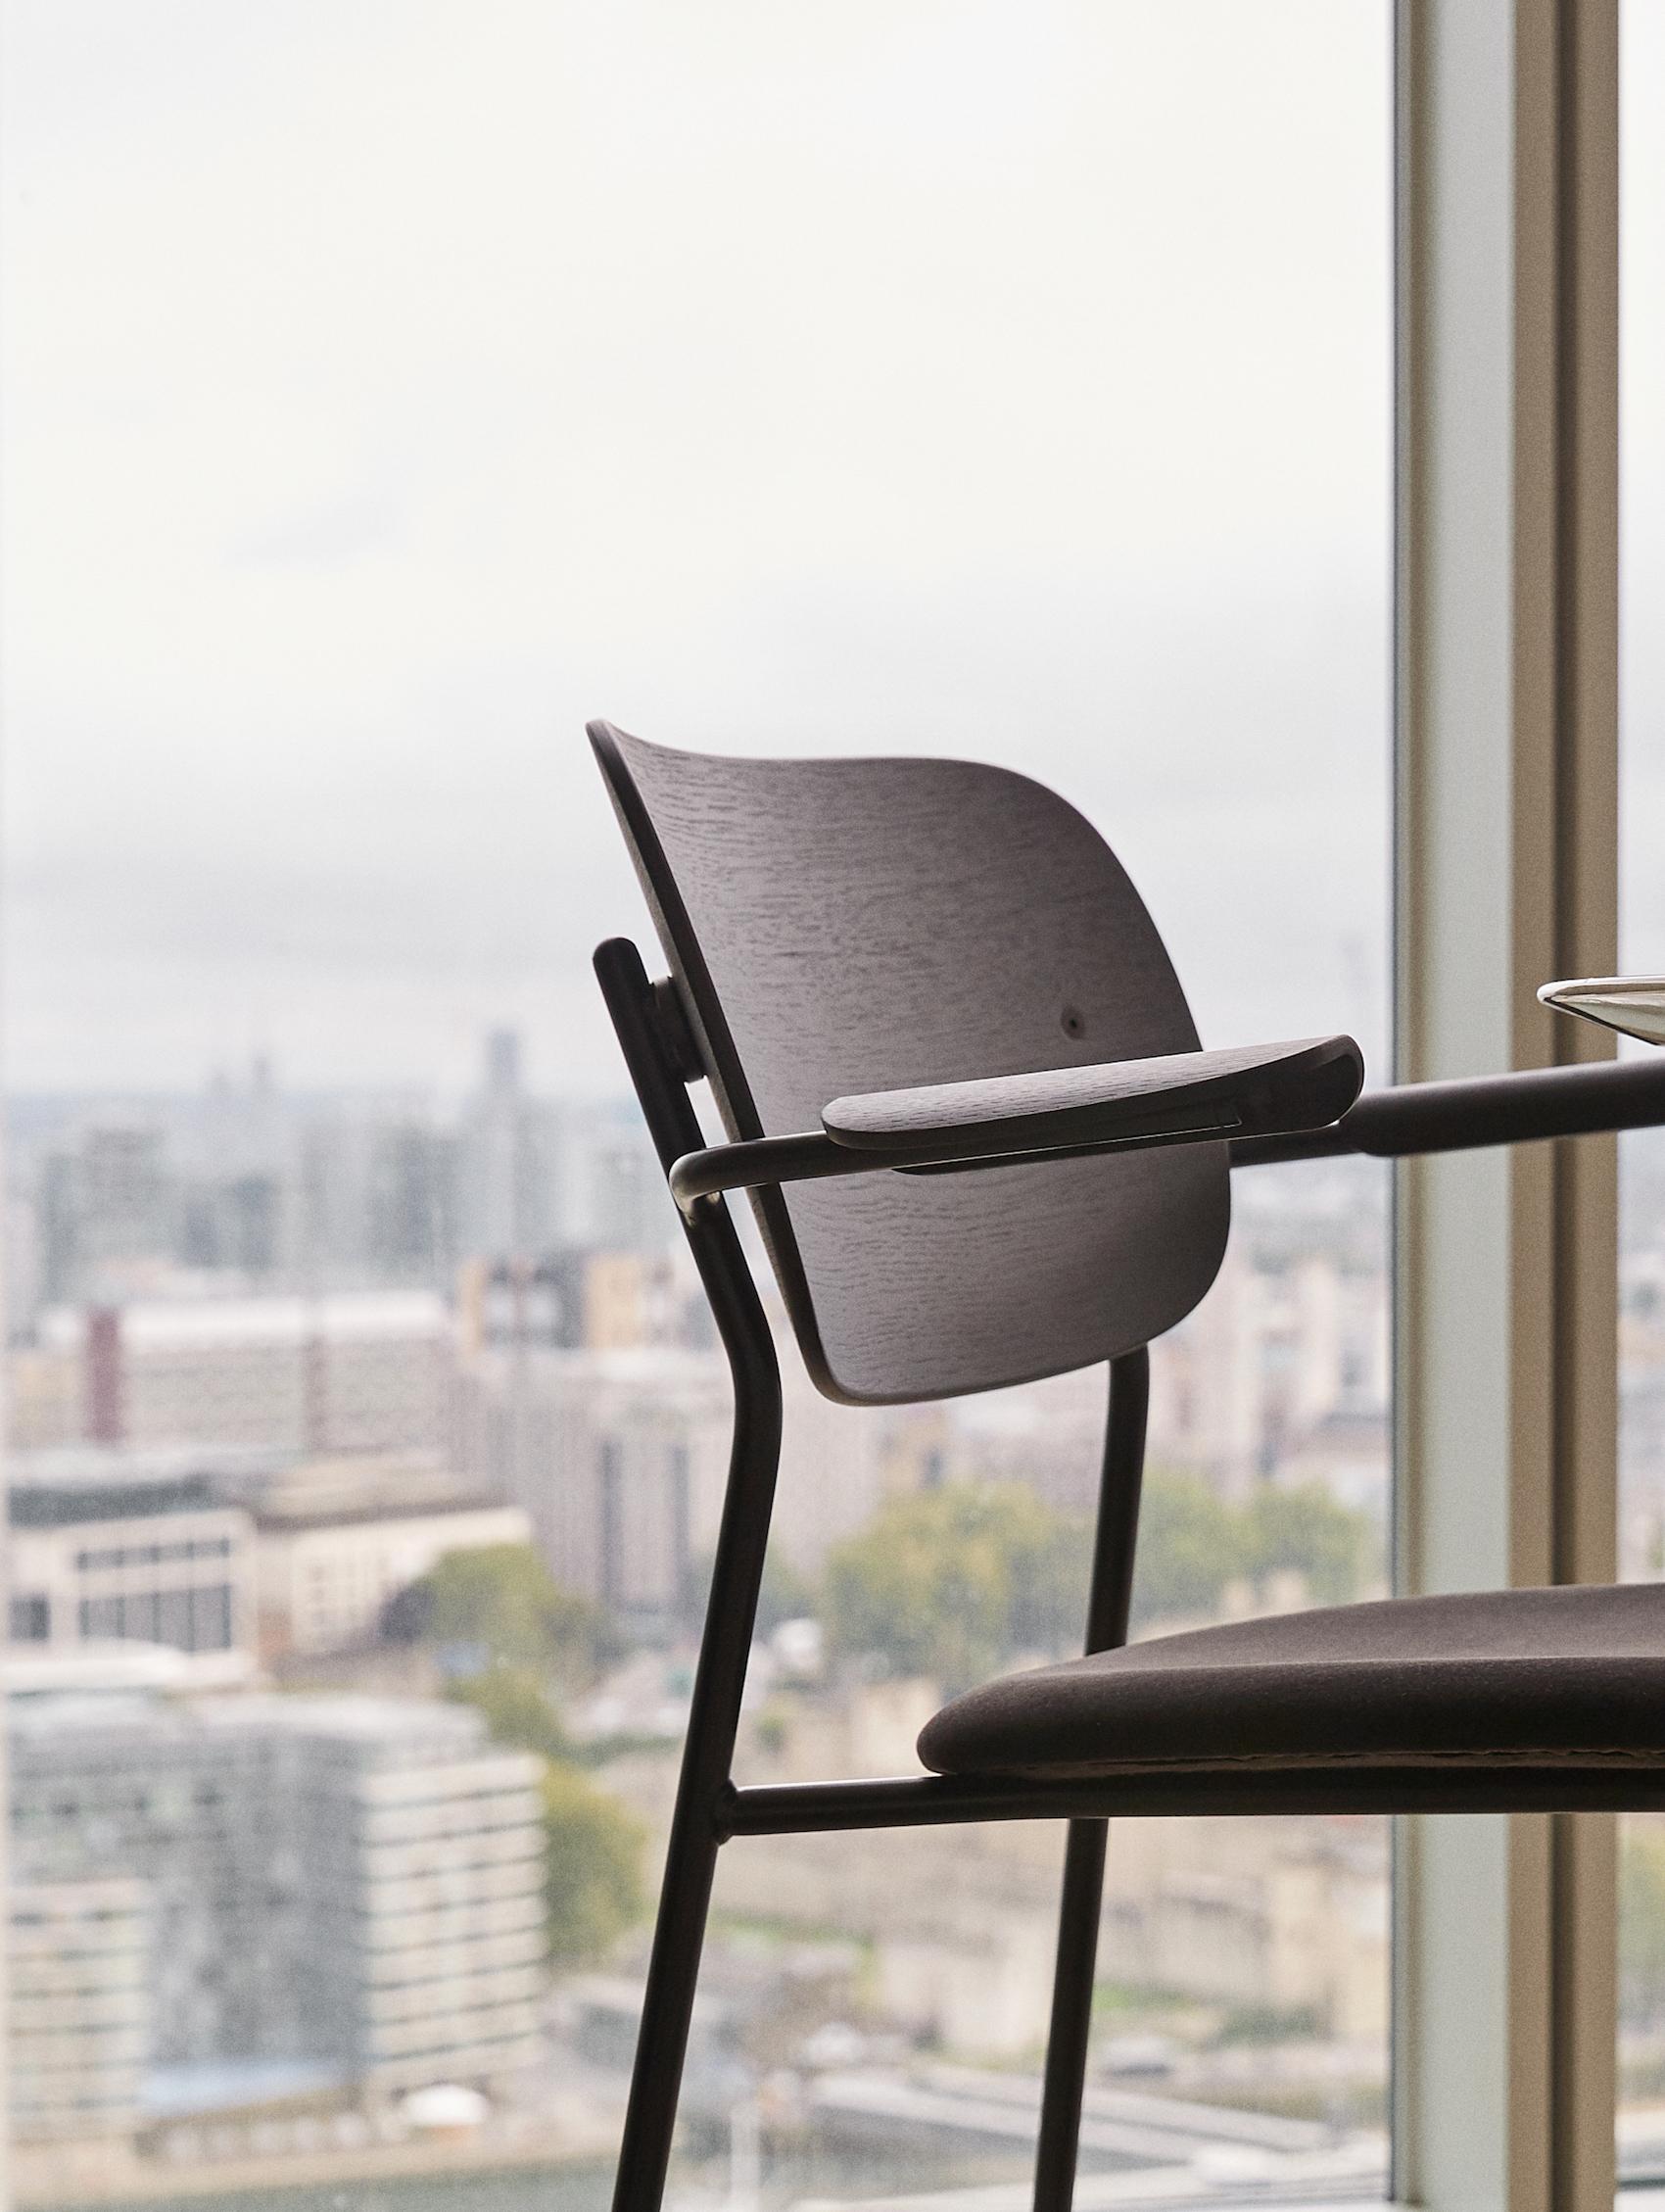 Co Chair The Lab Menu, modern furniture, chair, scandinavian design, scandinavian home The Chard project 3.jpg